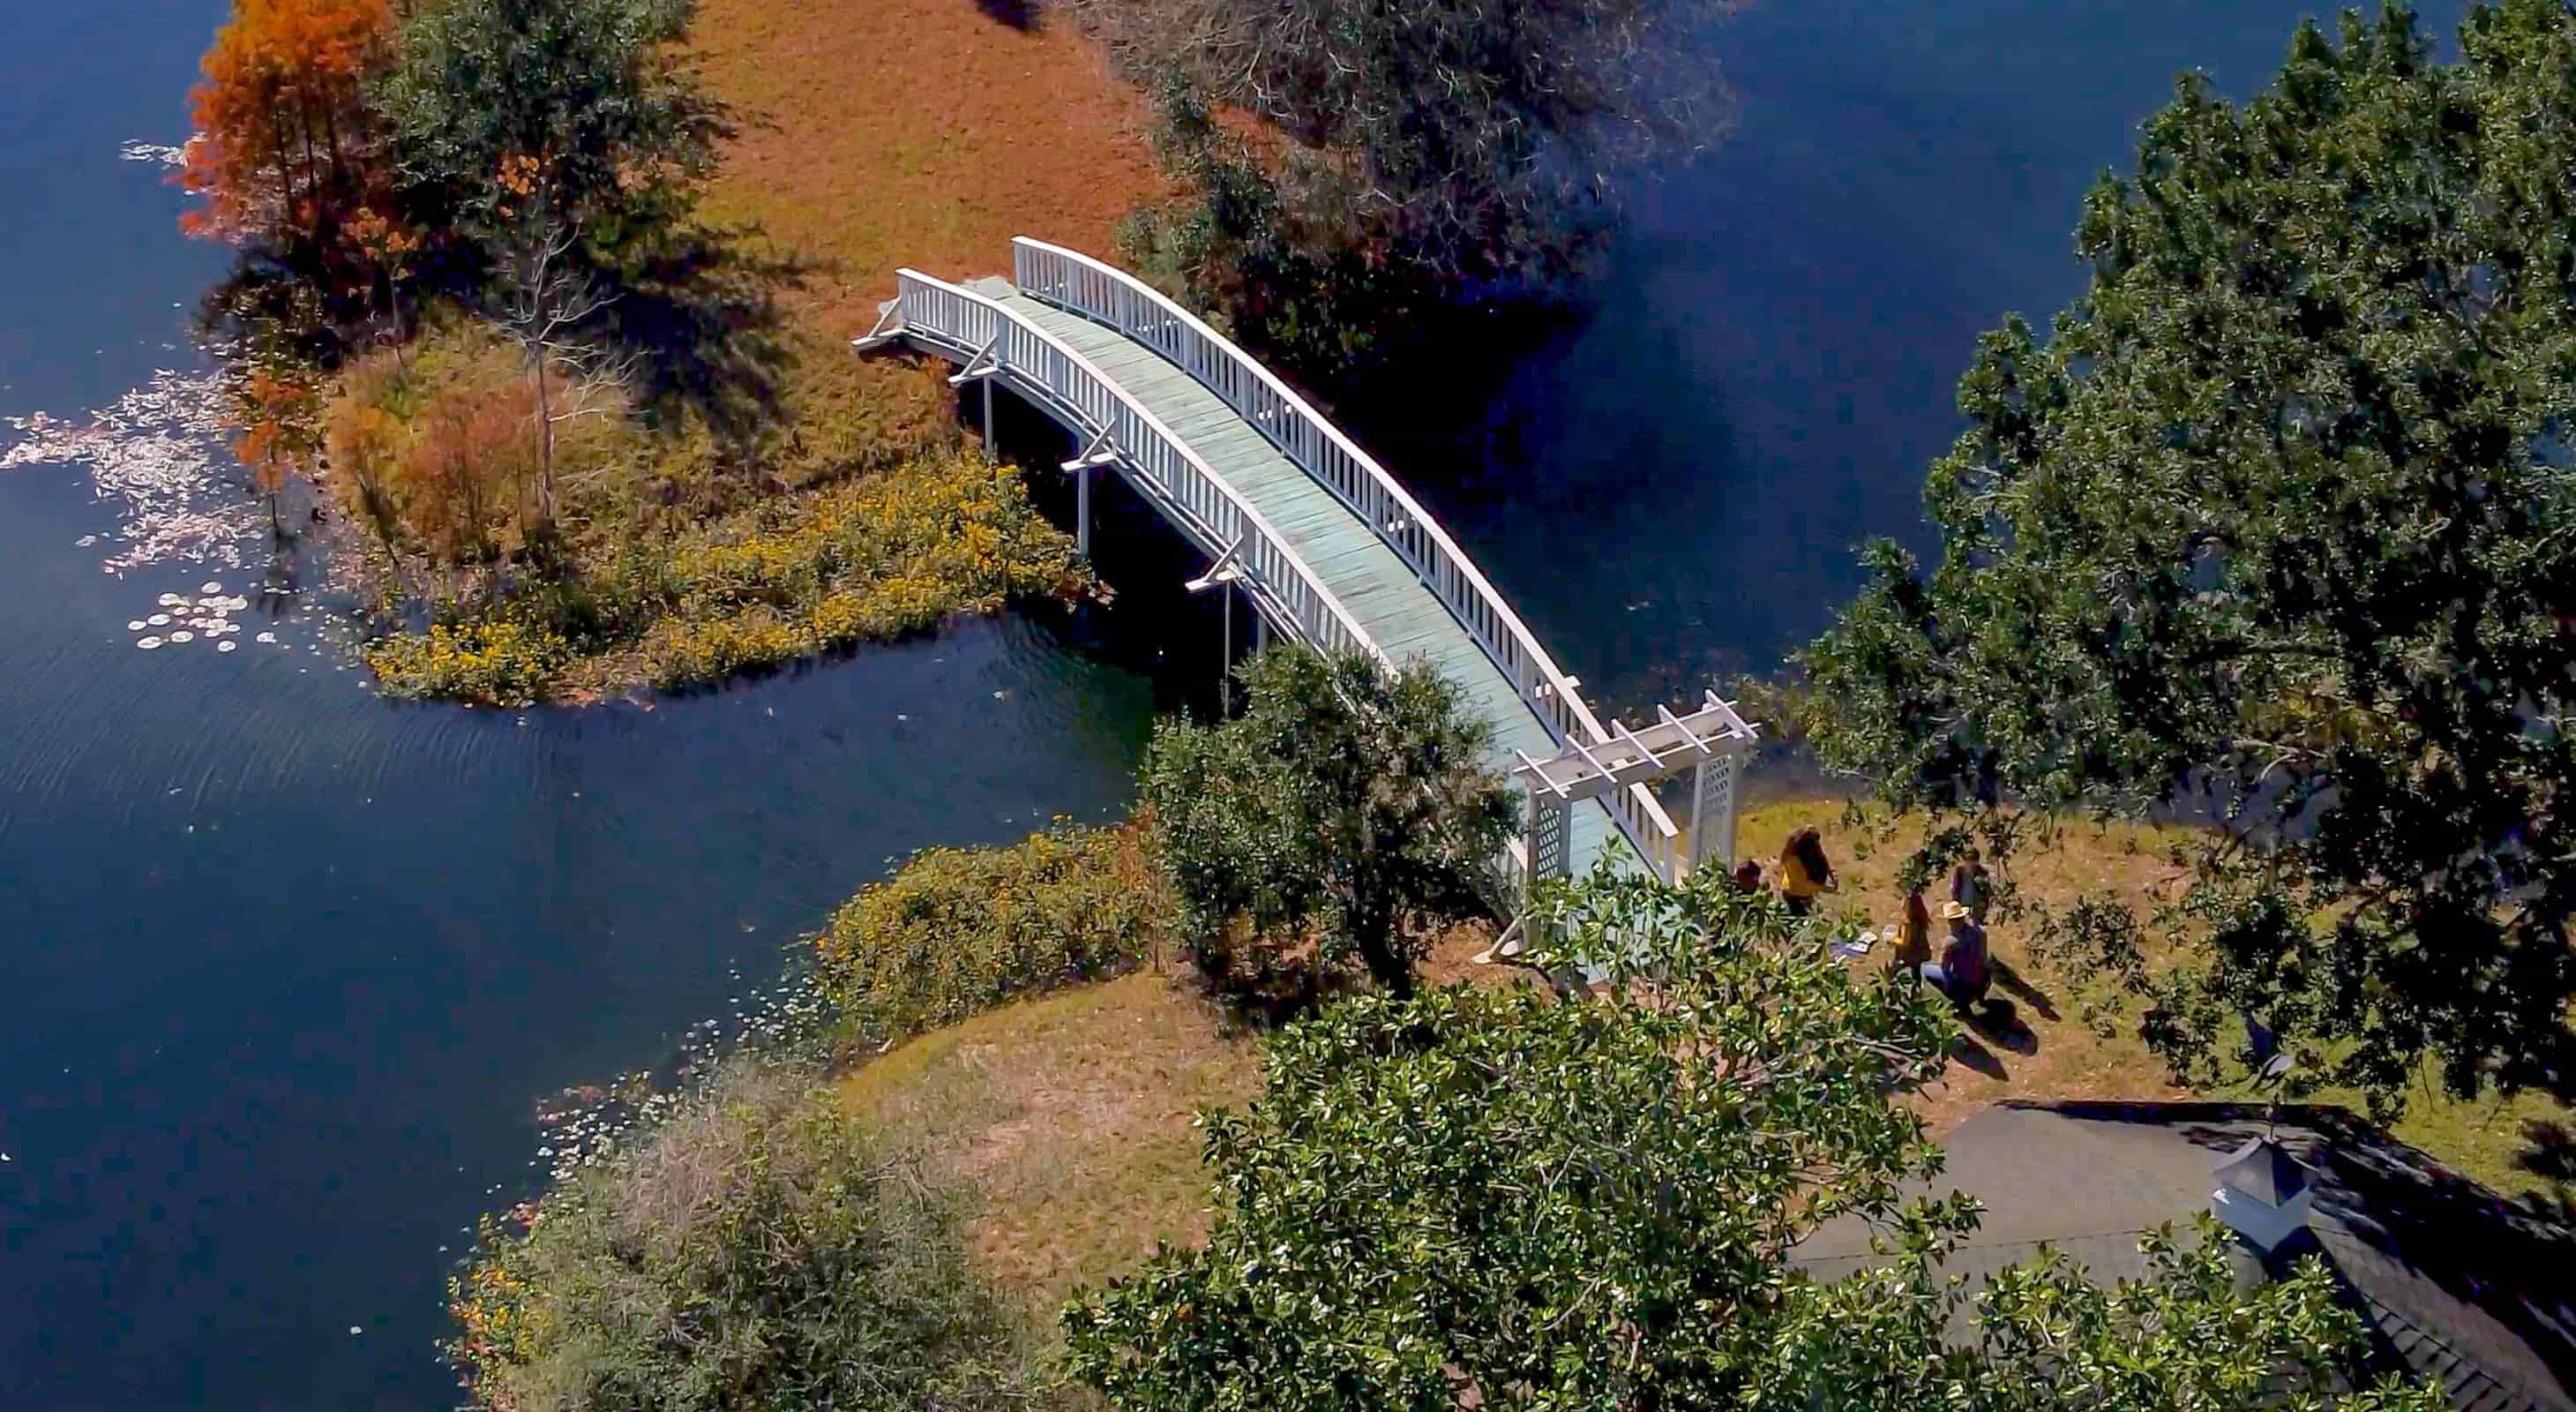 Bridge across the private lake